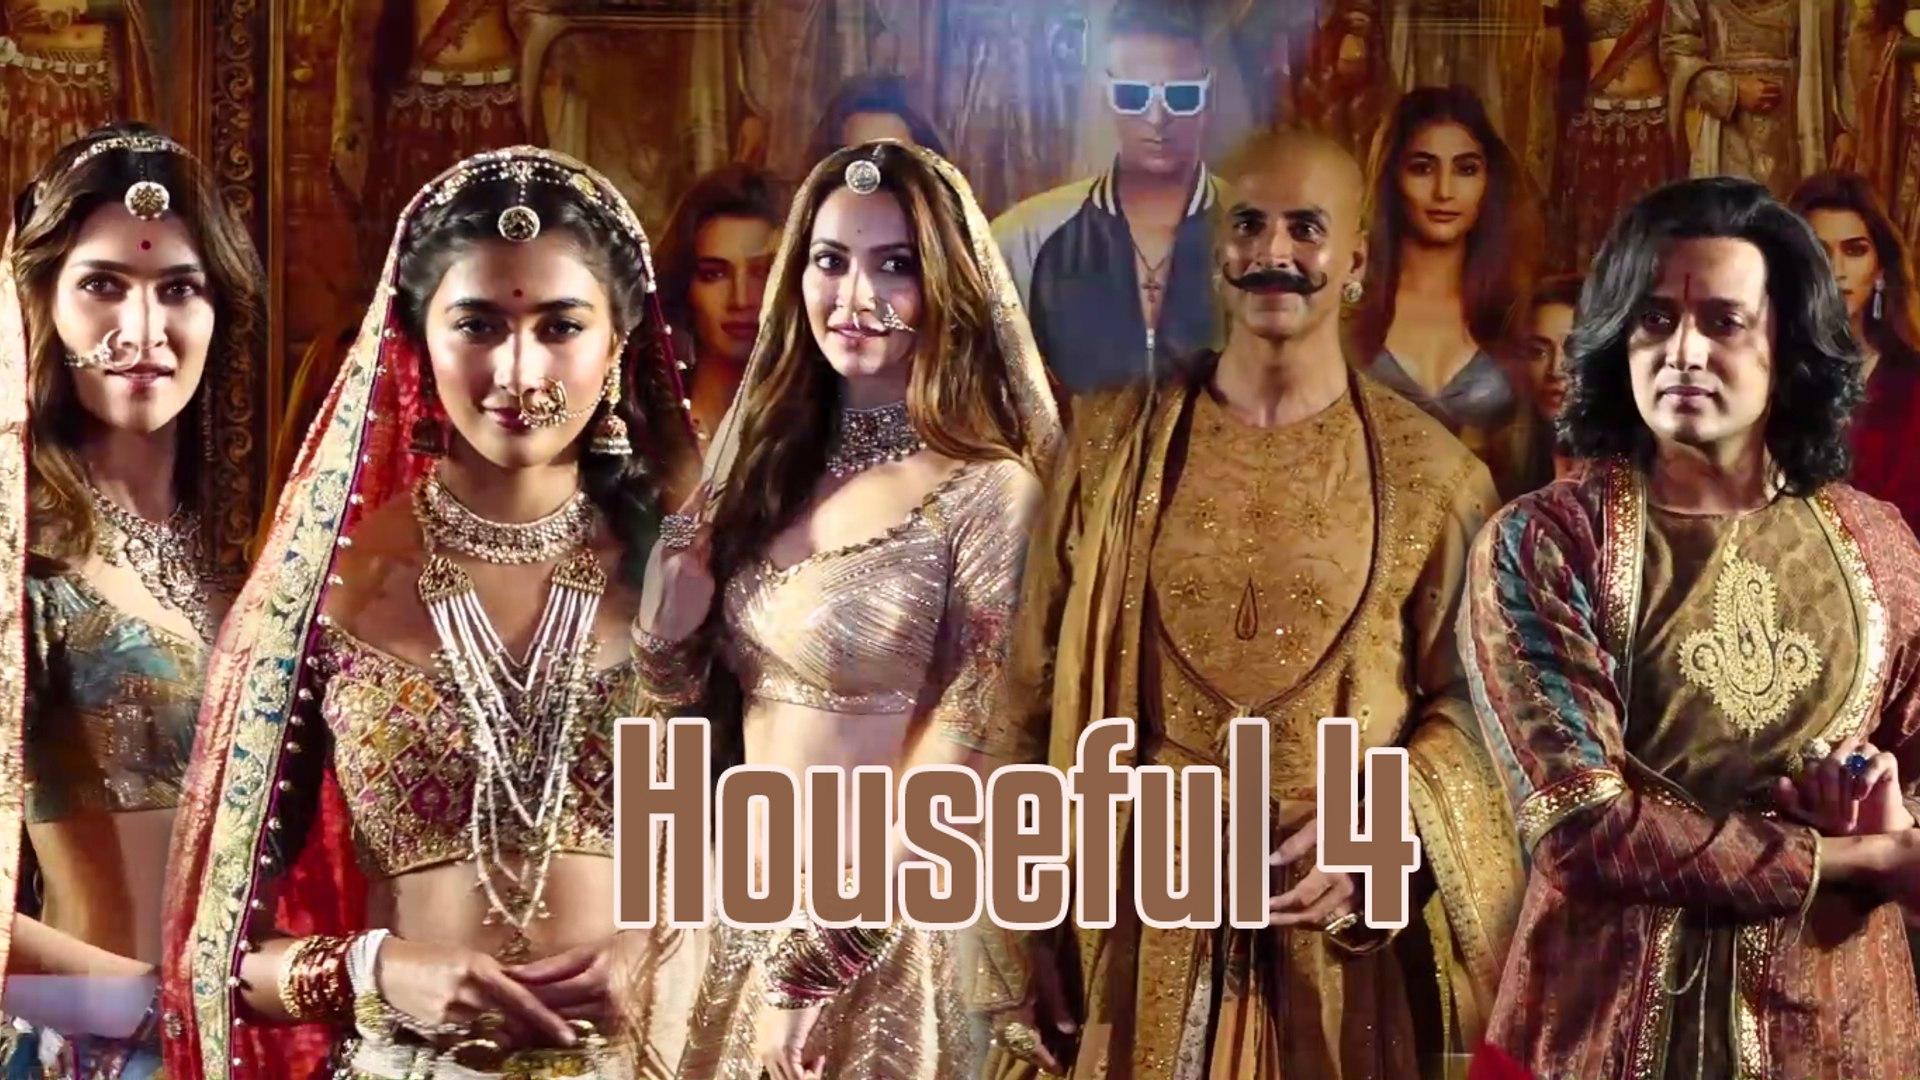 Housefull 4 Trailer Launch Complete Video Hd Akshay Kumar Riteish Deshmukh Bobby Deol Video Dailymotion